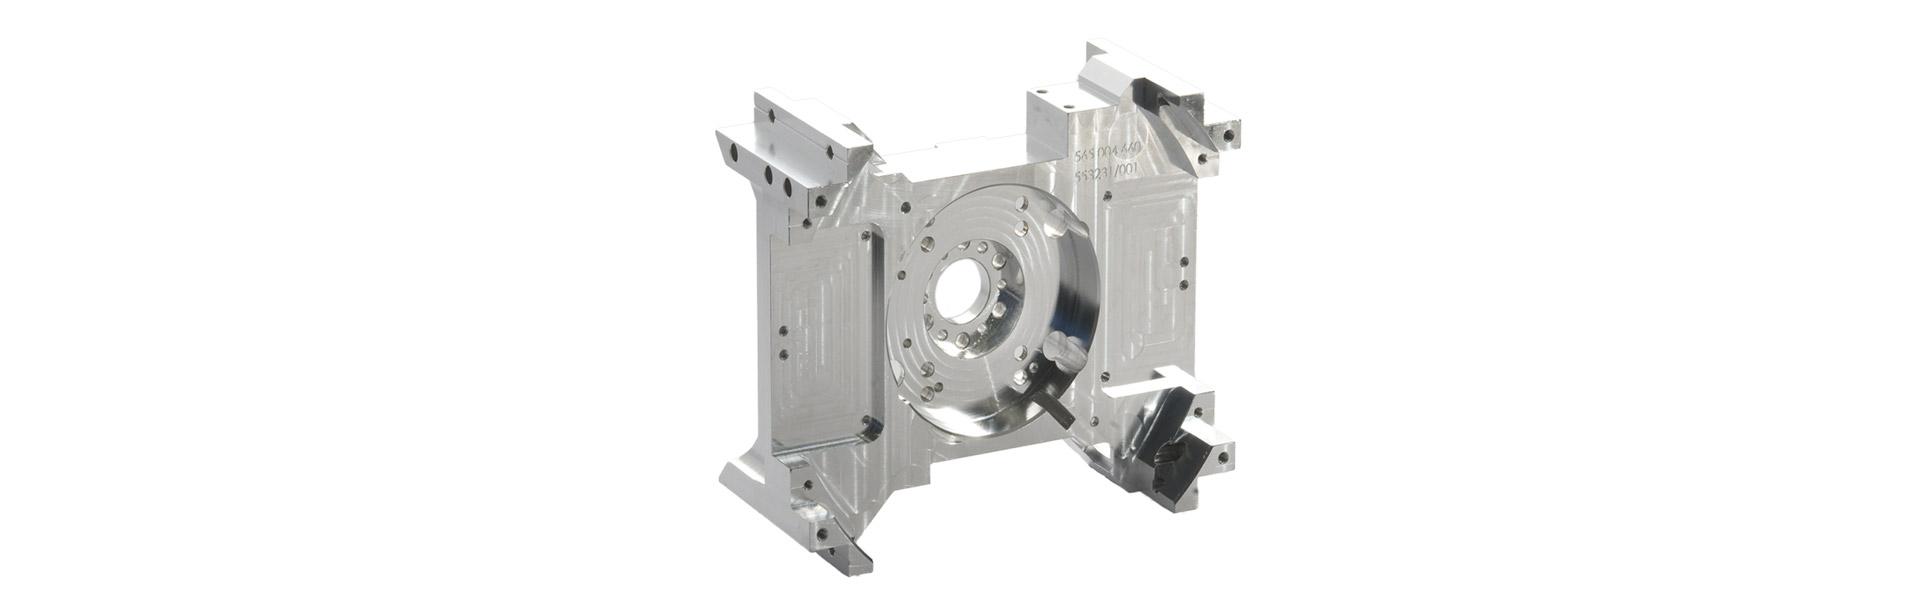 CNC- Fräsen in der Präzisionsmechanik